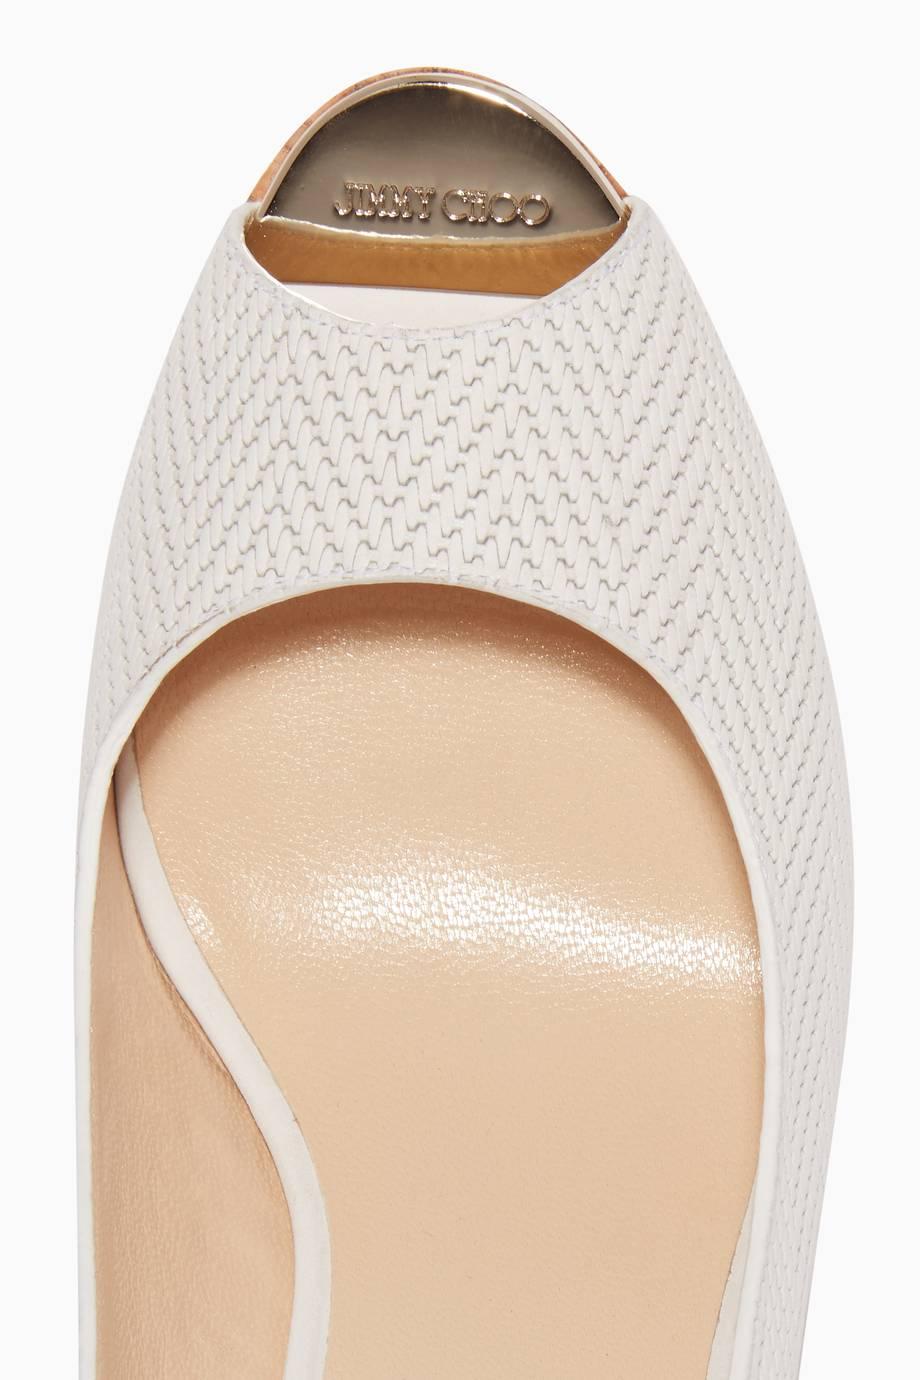 6ab965cd8de1 Shop Luxury Jimmy Choo Latte-White Prova Knit Wedges